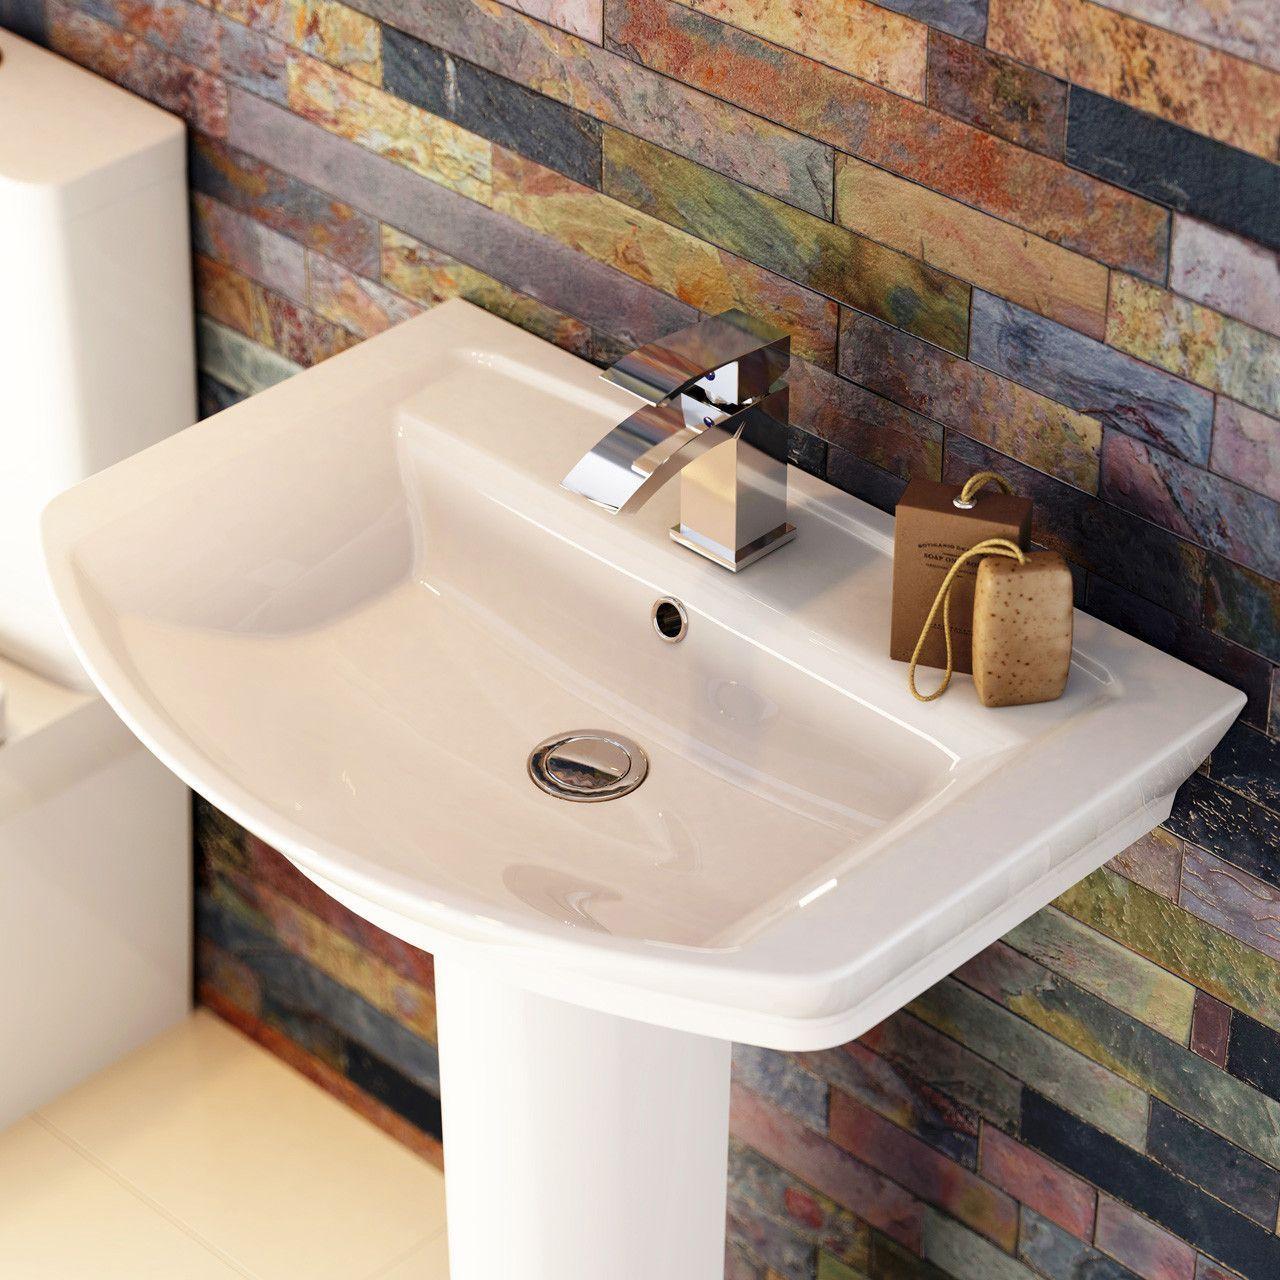 49 ideal bathroom sink ideas for small bathroom space modern decor rh pinterest com